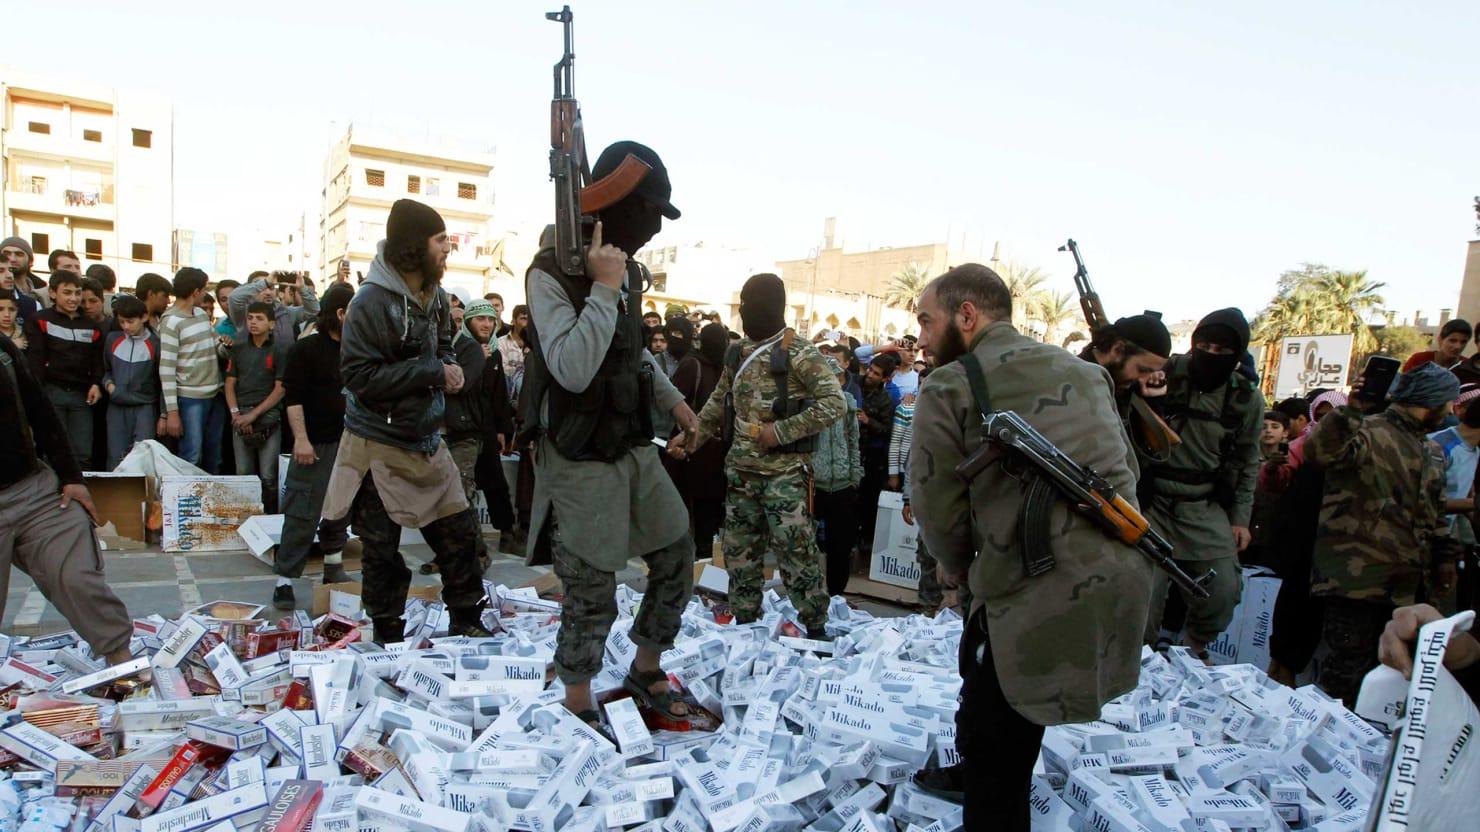 Smokers Rebel Against ISIS Cig Ban